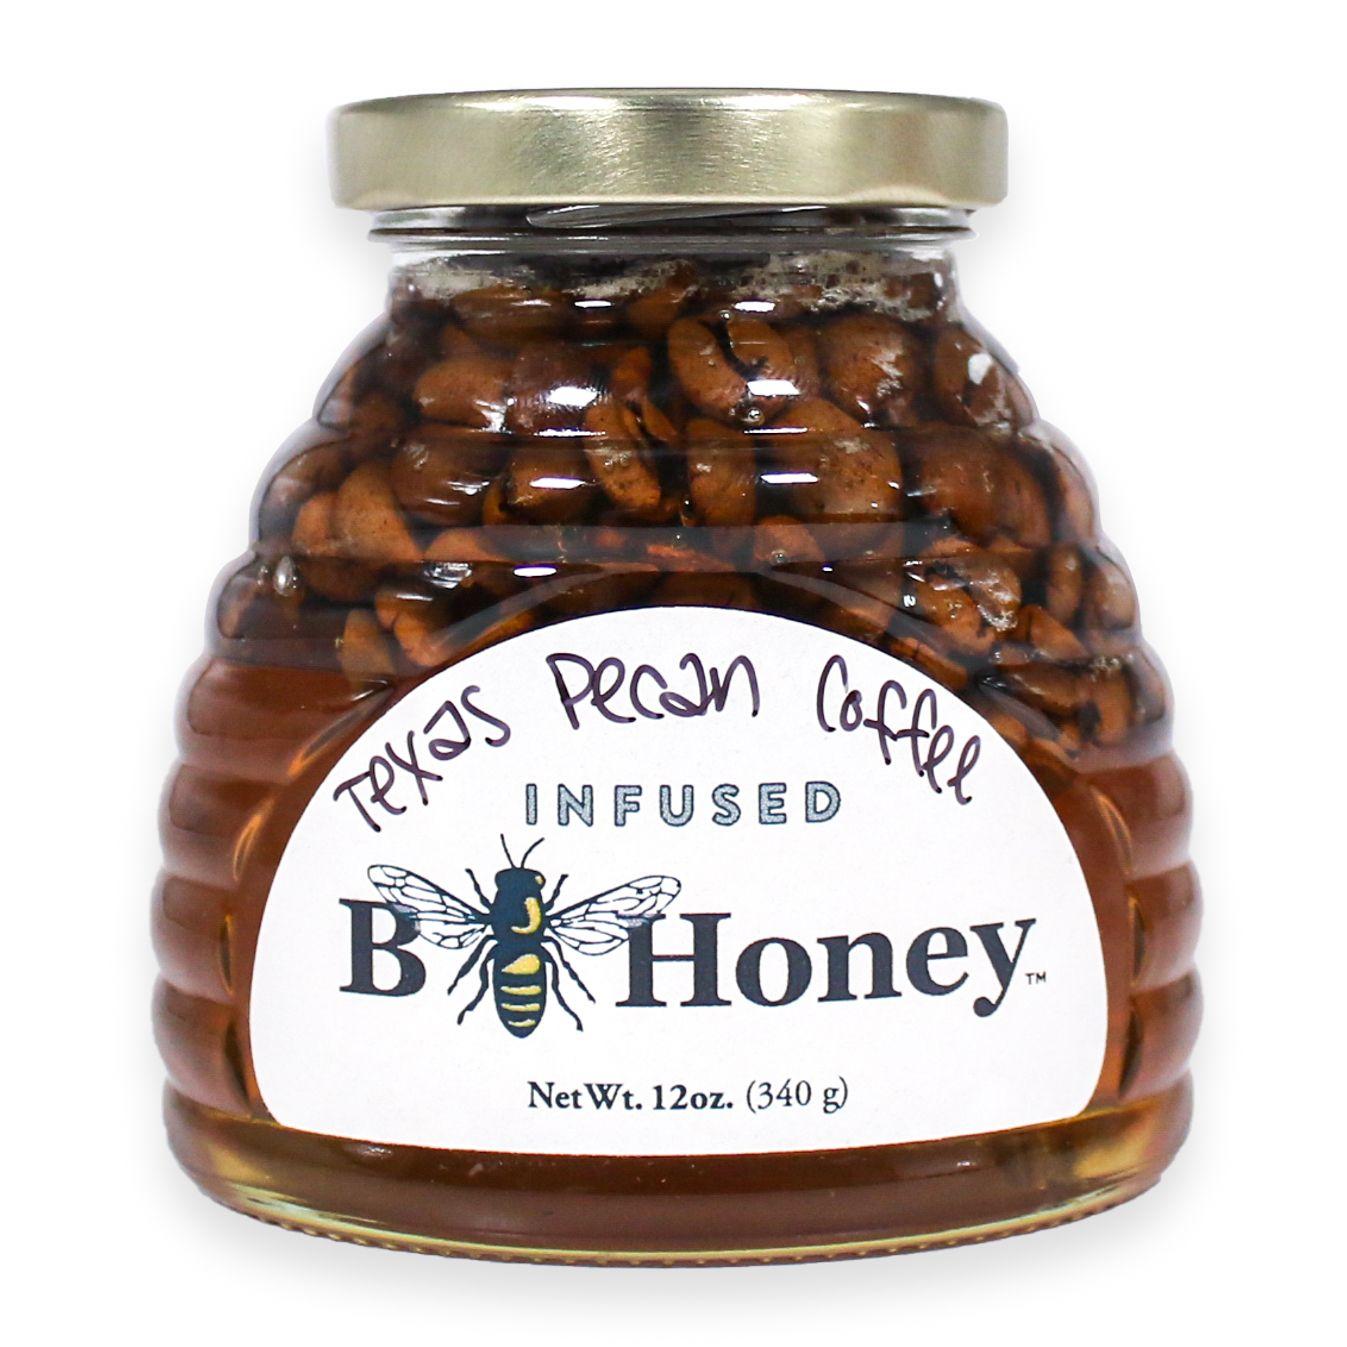 Beeweaver texas pecan coffee infused honey texas pecans